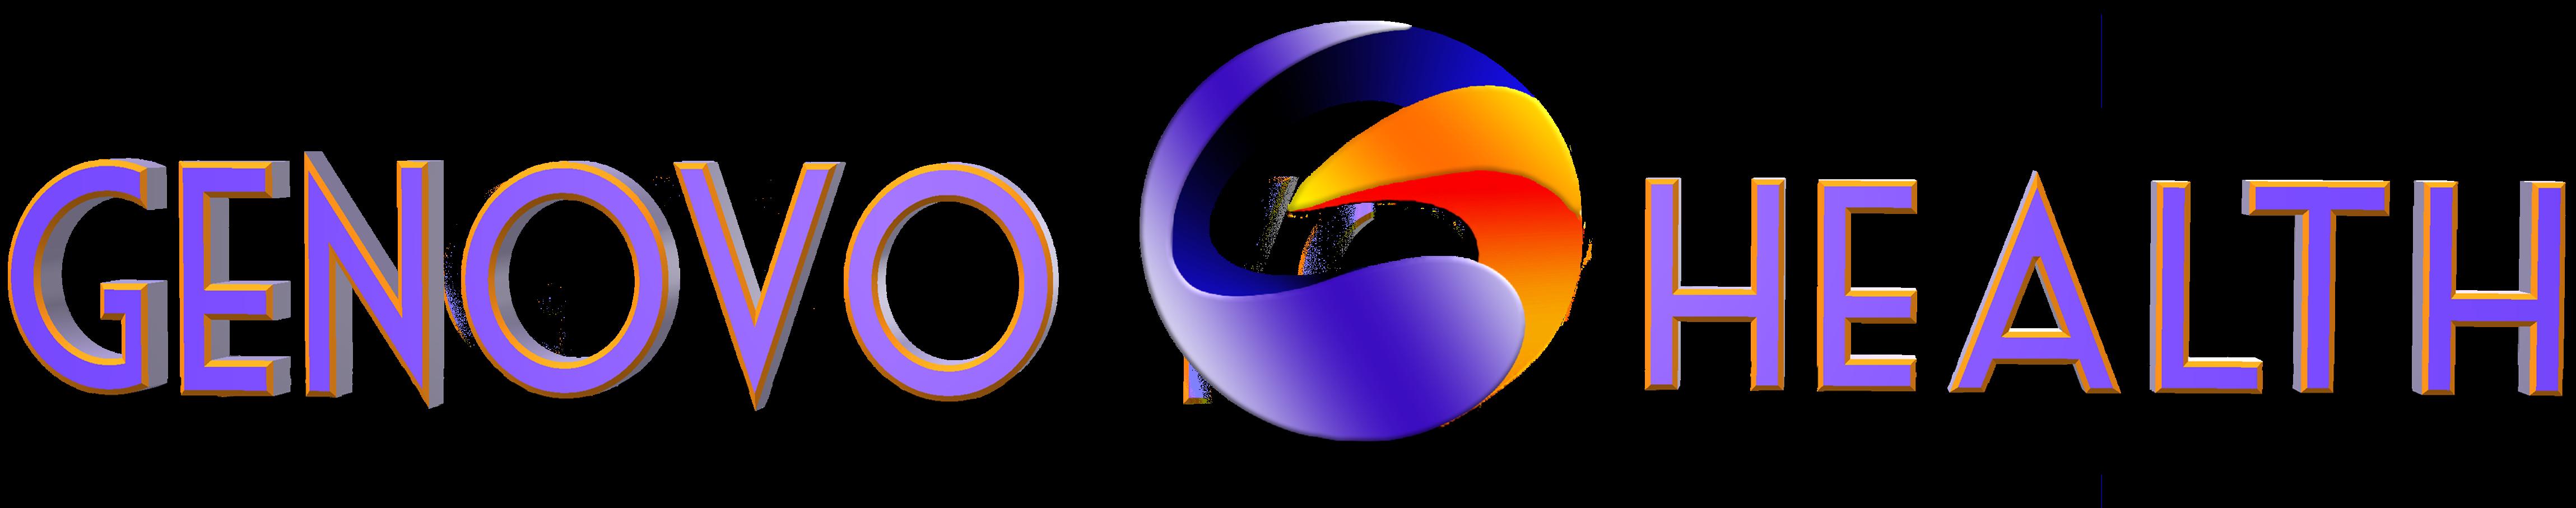 Genovo Health logo